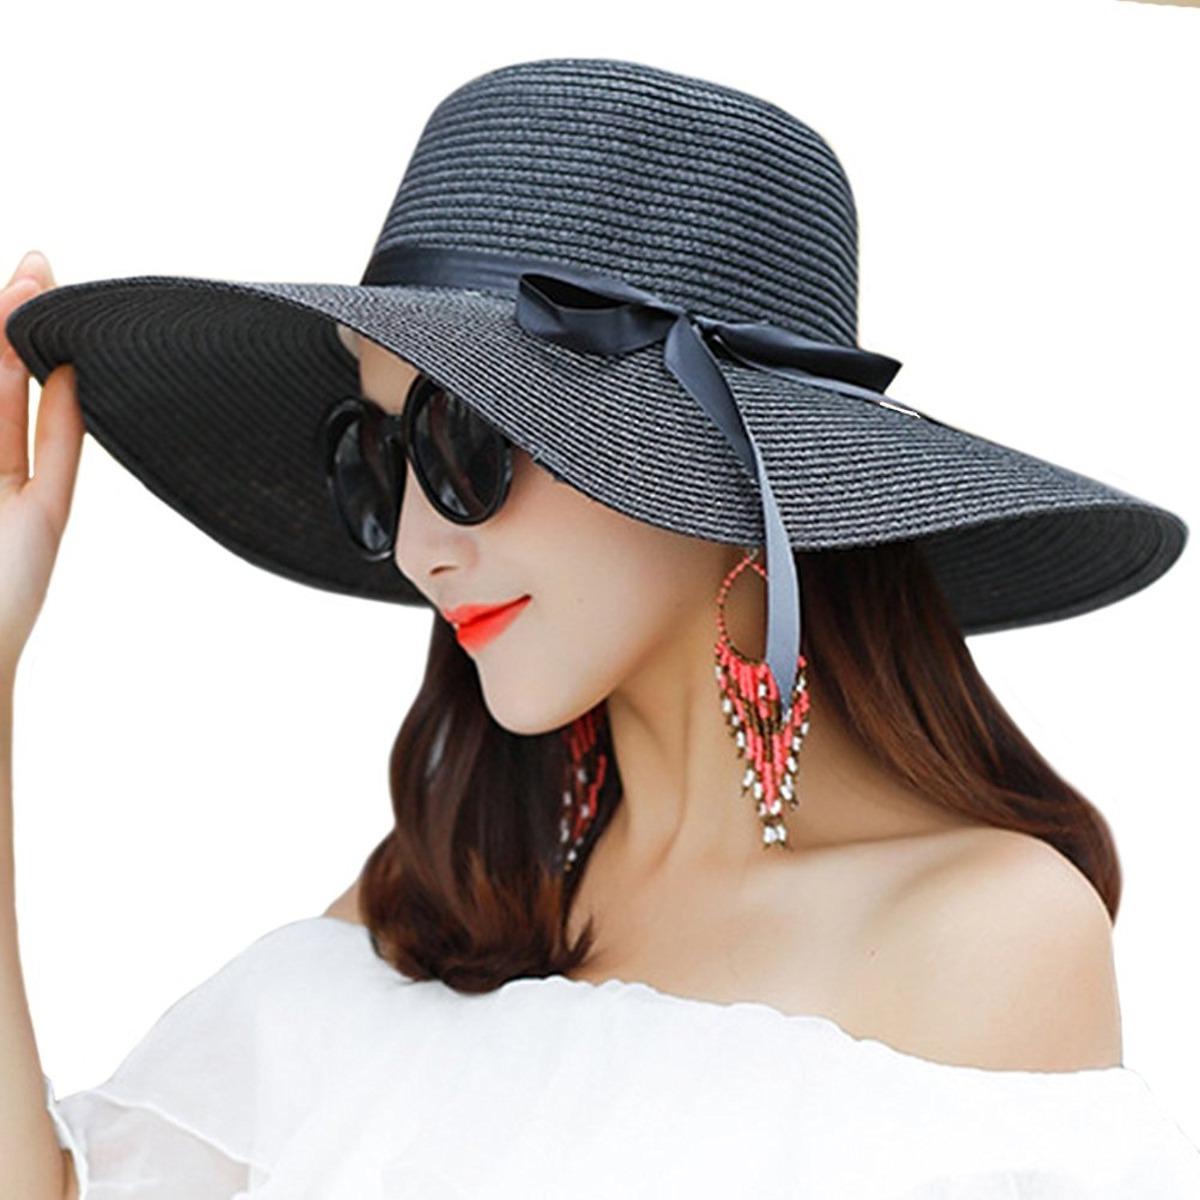 5f7164b67e88c Cargando zoom... mujer sombrero sombrero. Cargando zoom... sombrero de ala  grande para mujer sombrero de paja plegable